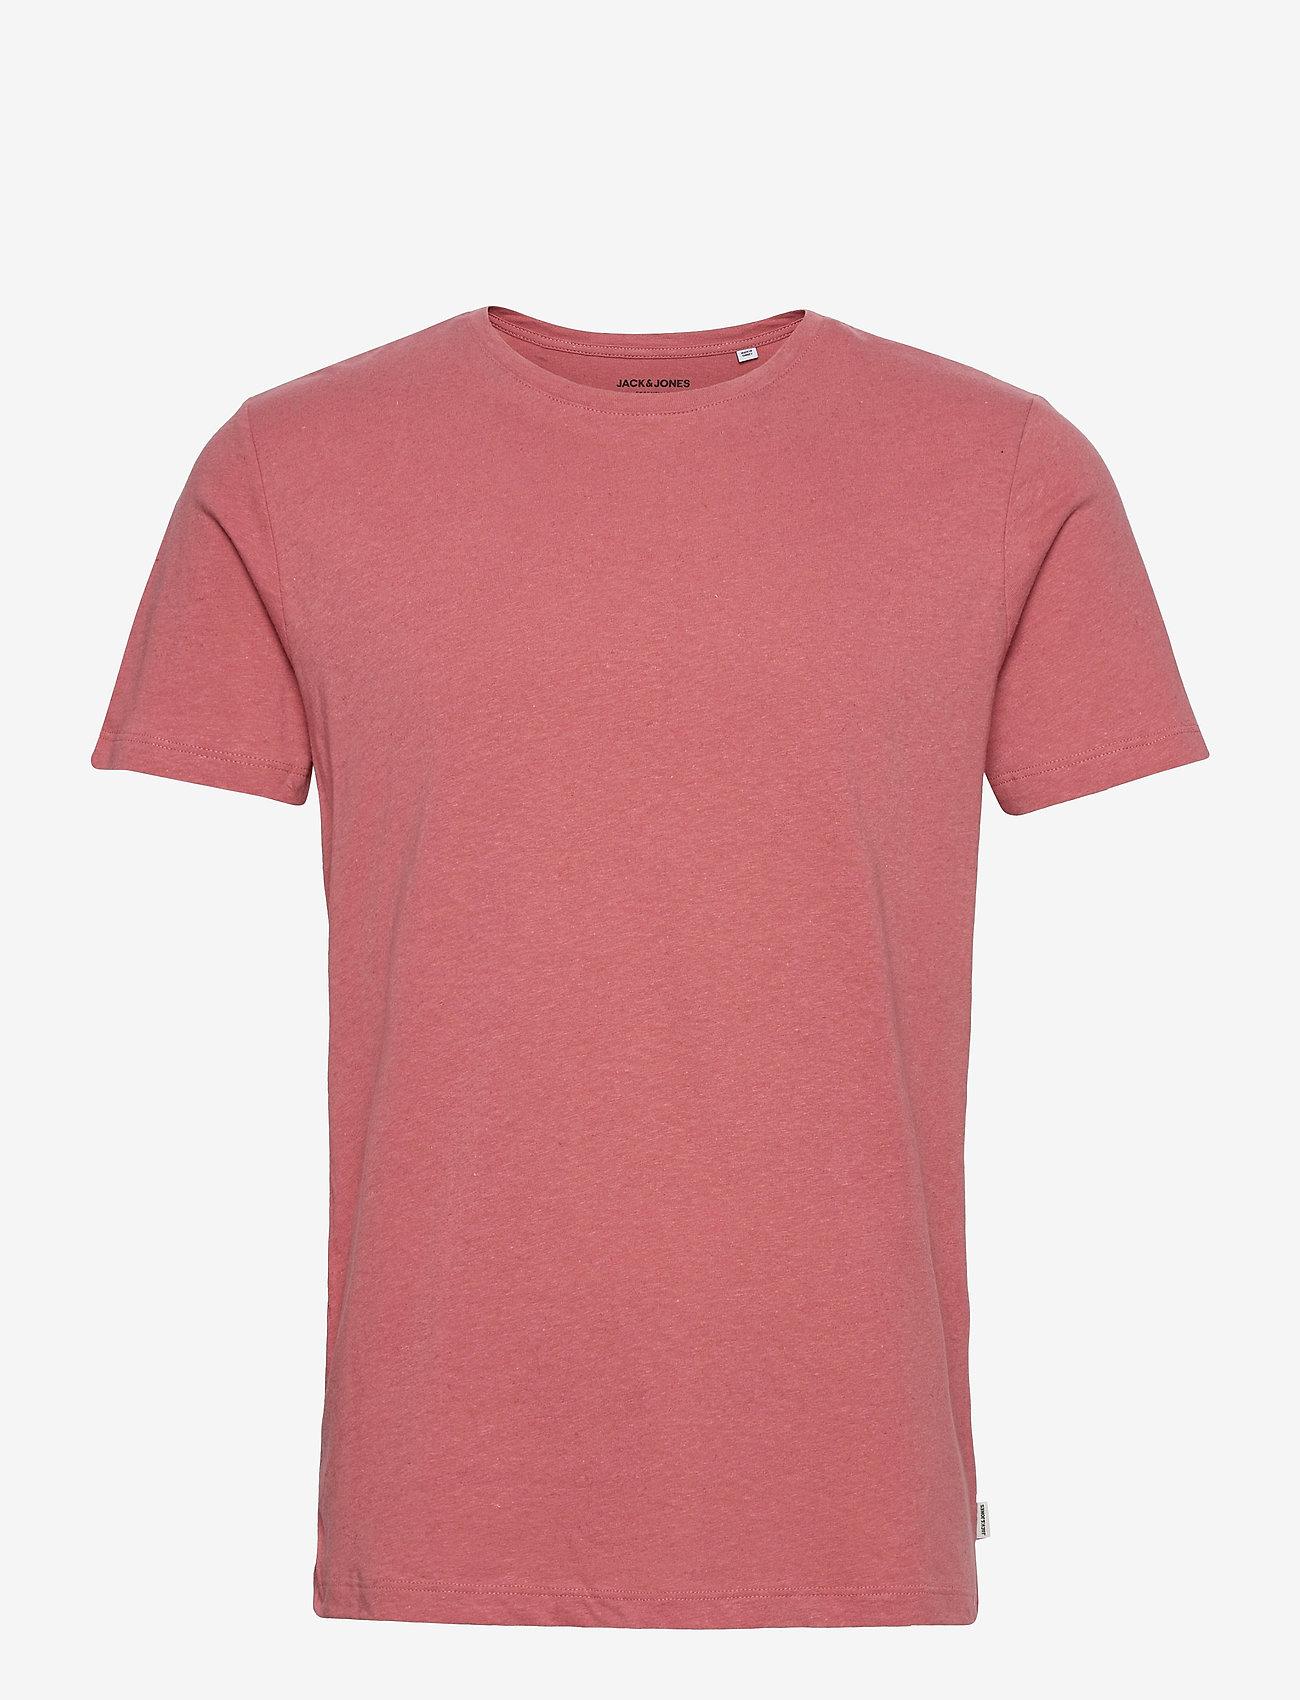 Jack & Jones - JJELINEN BASIC TEE SS CREW NECK STS - basic t-shirts - slate rose - 0